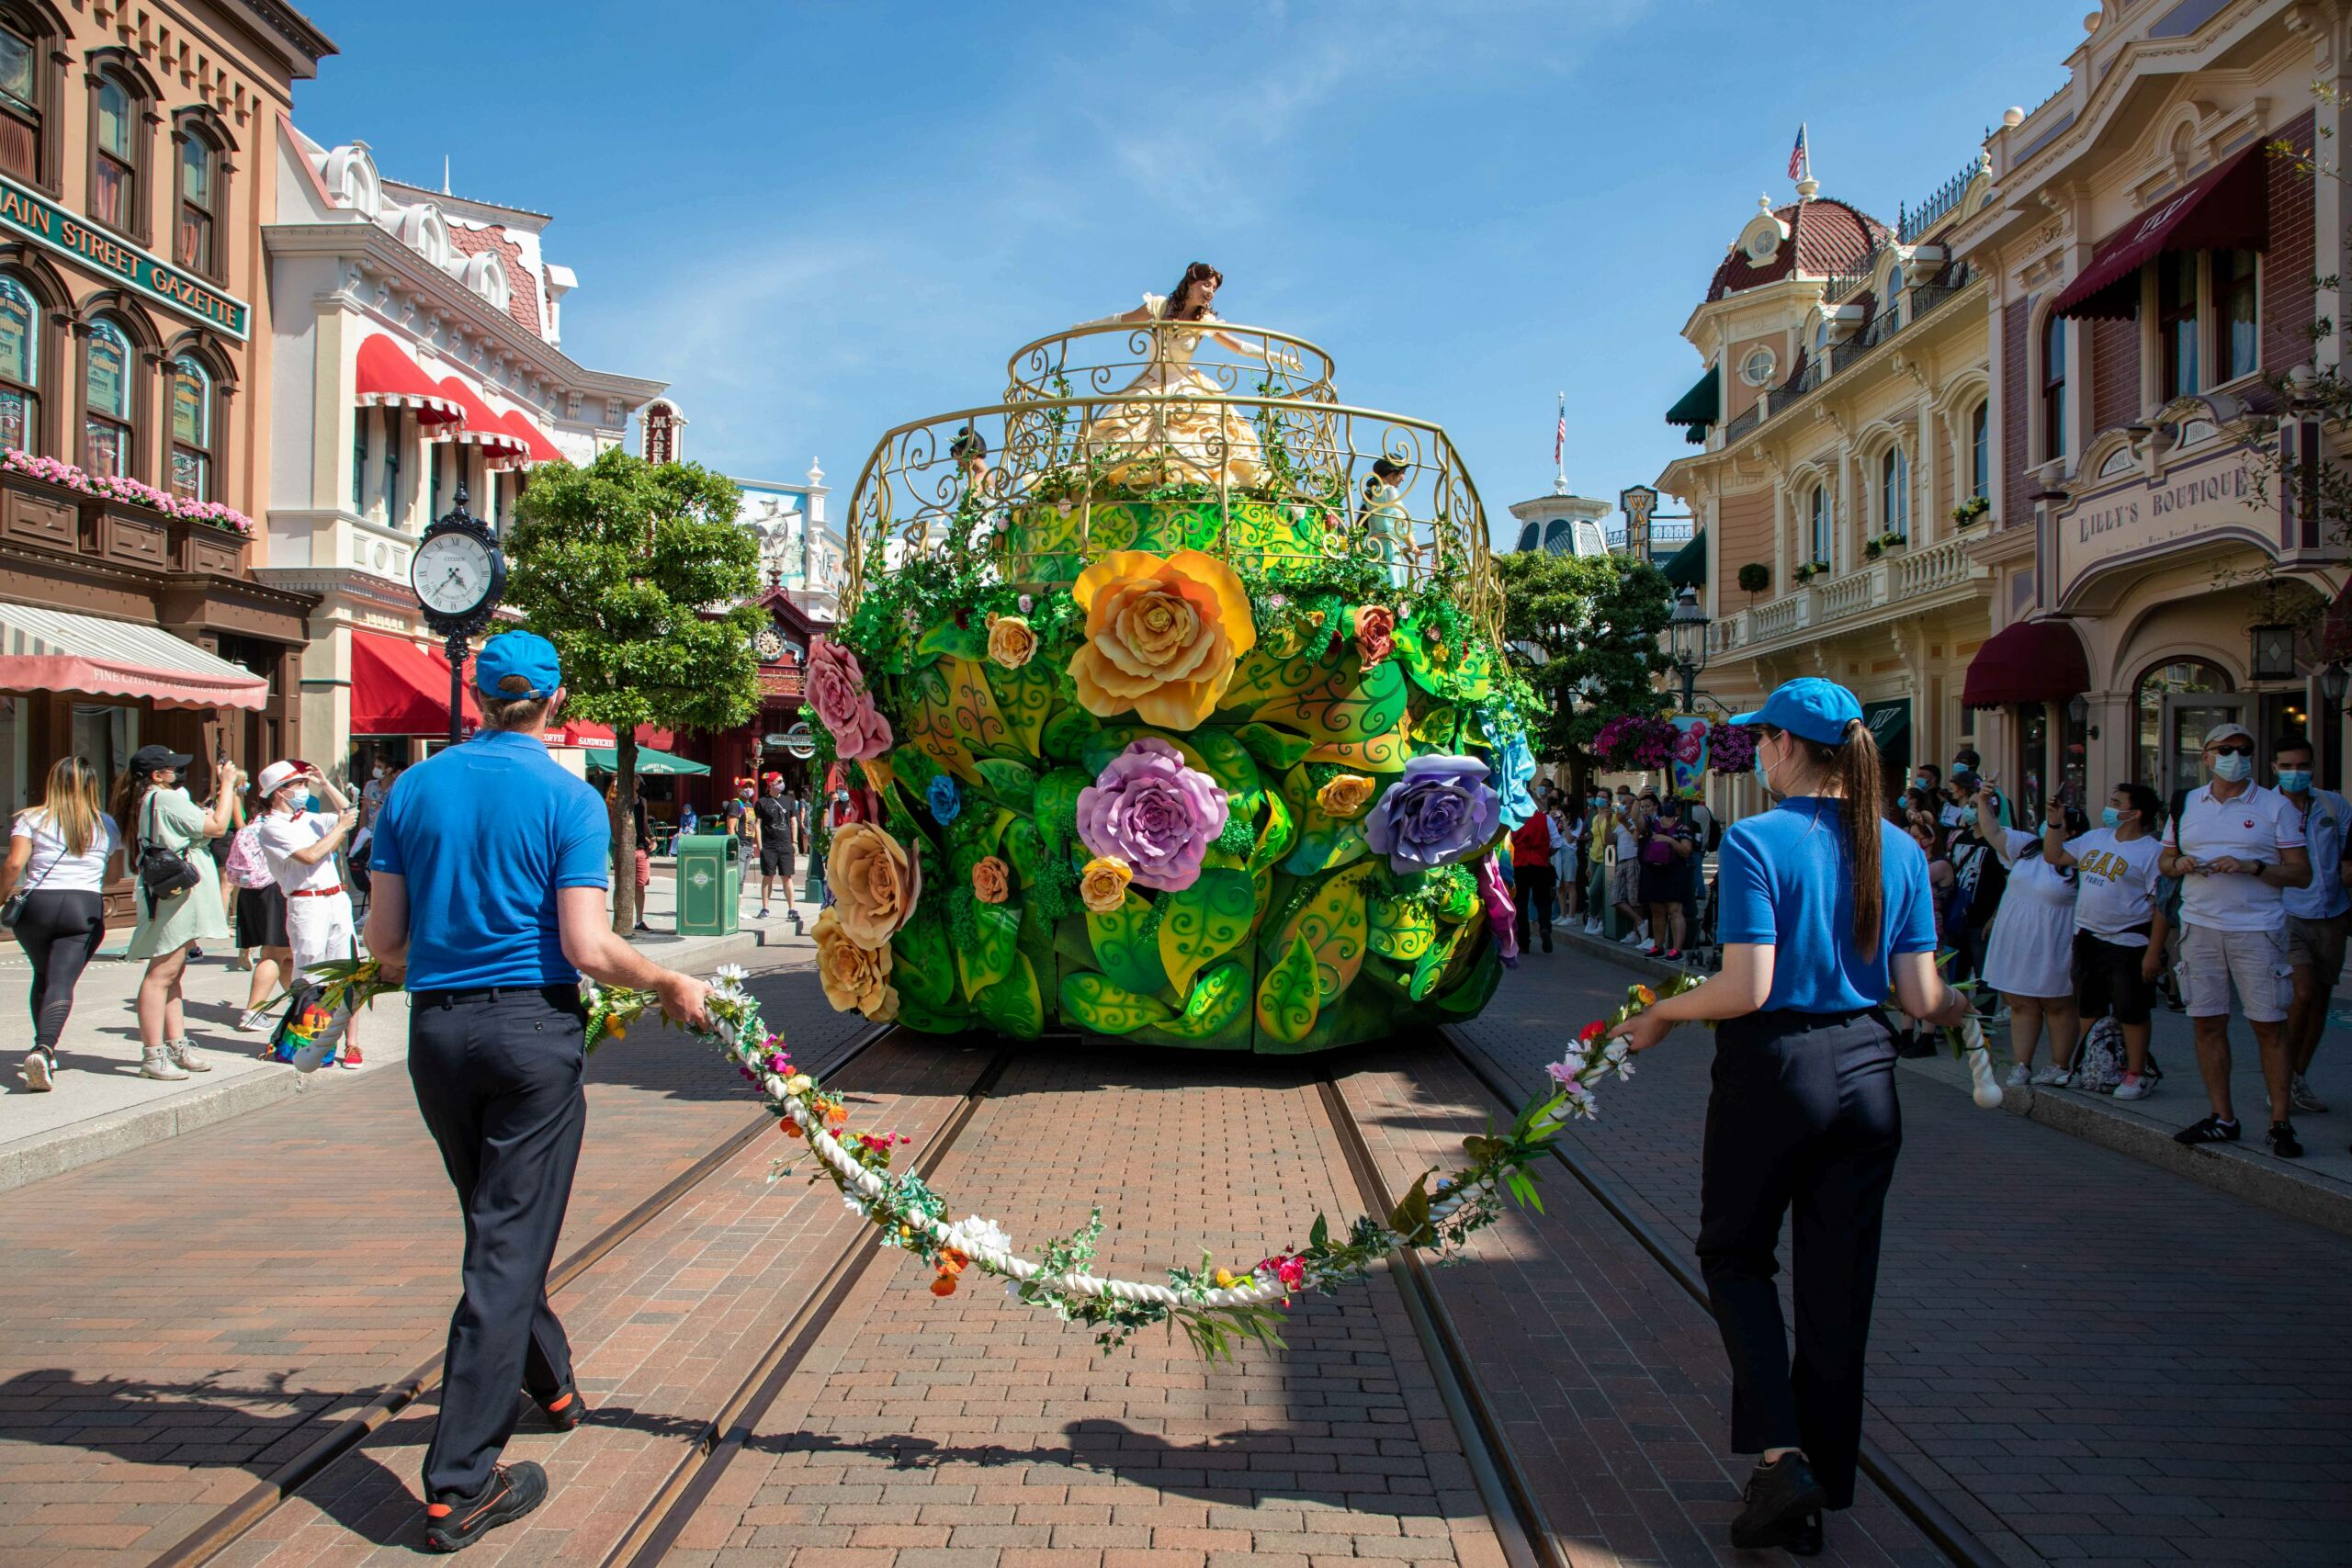 Riapertura di Disneyland Paris - Pagina 12 Enchan11